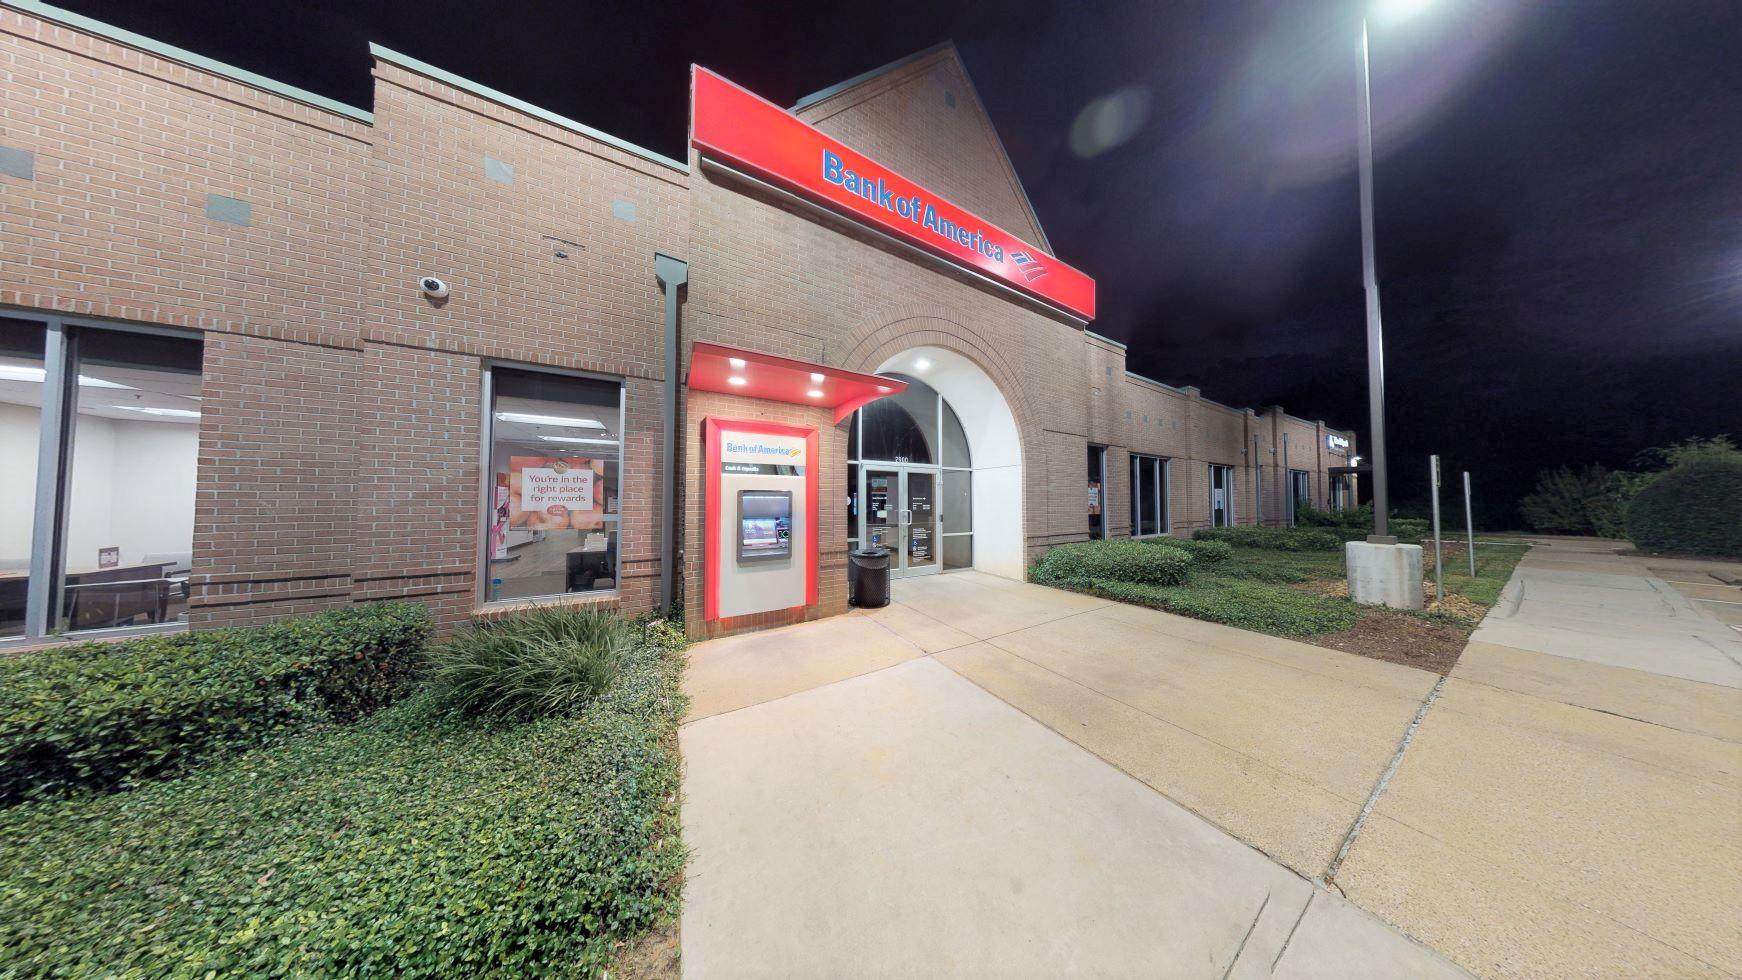 Bank of America financial center with drive-thru ATM   2900 W Davis St, Conroe, TX 77304